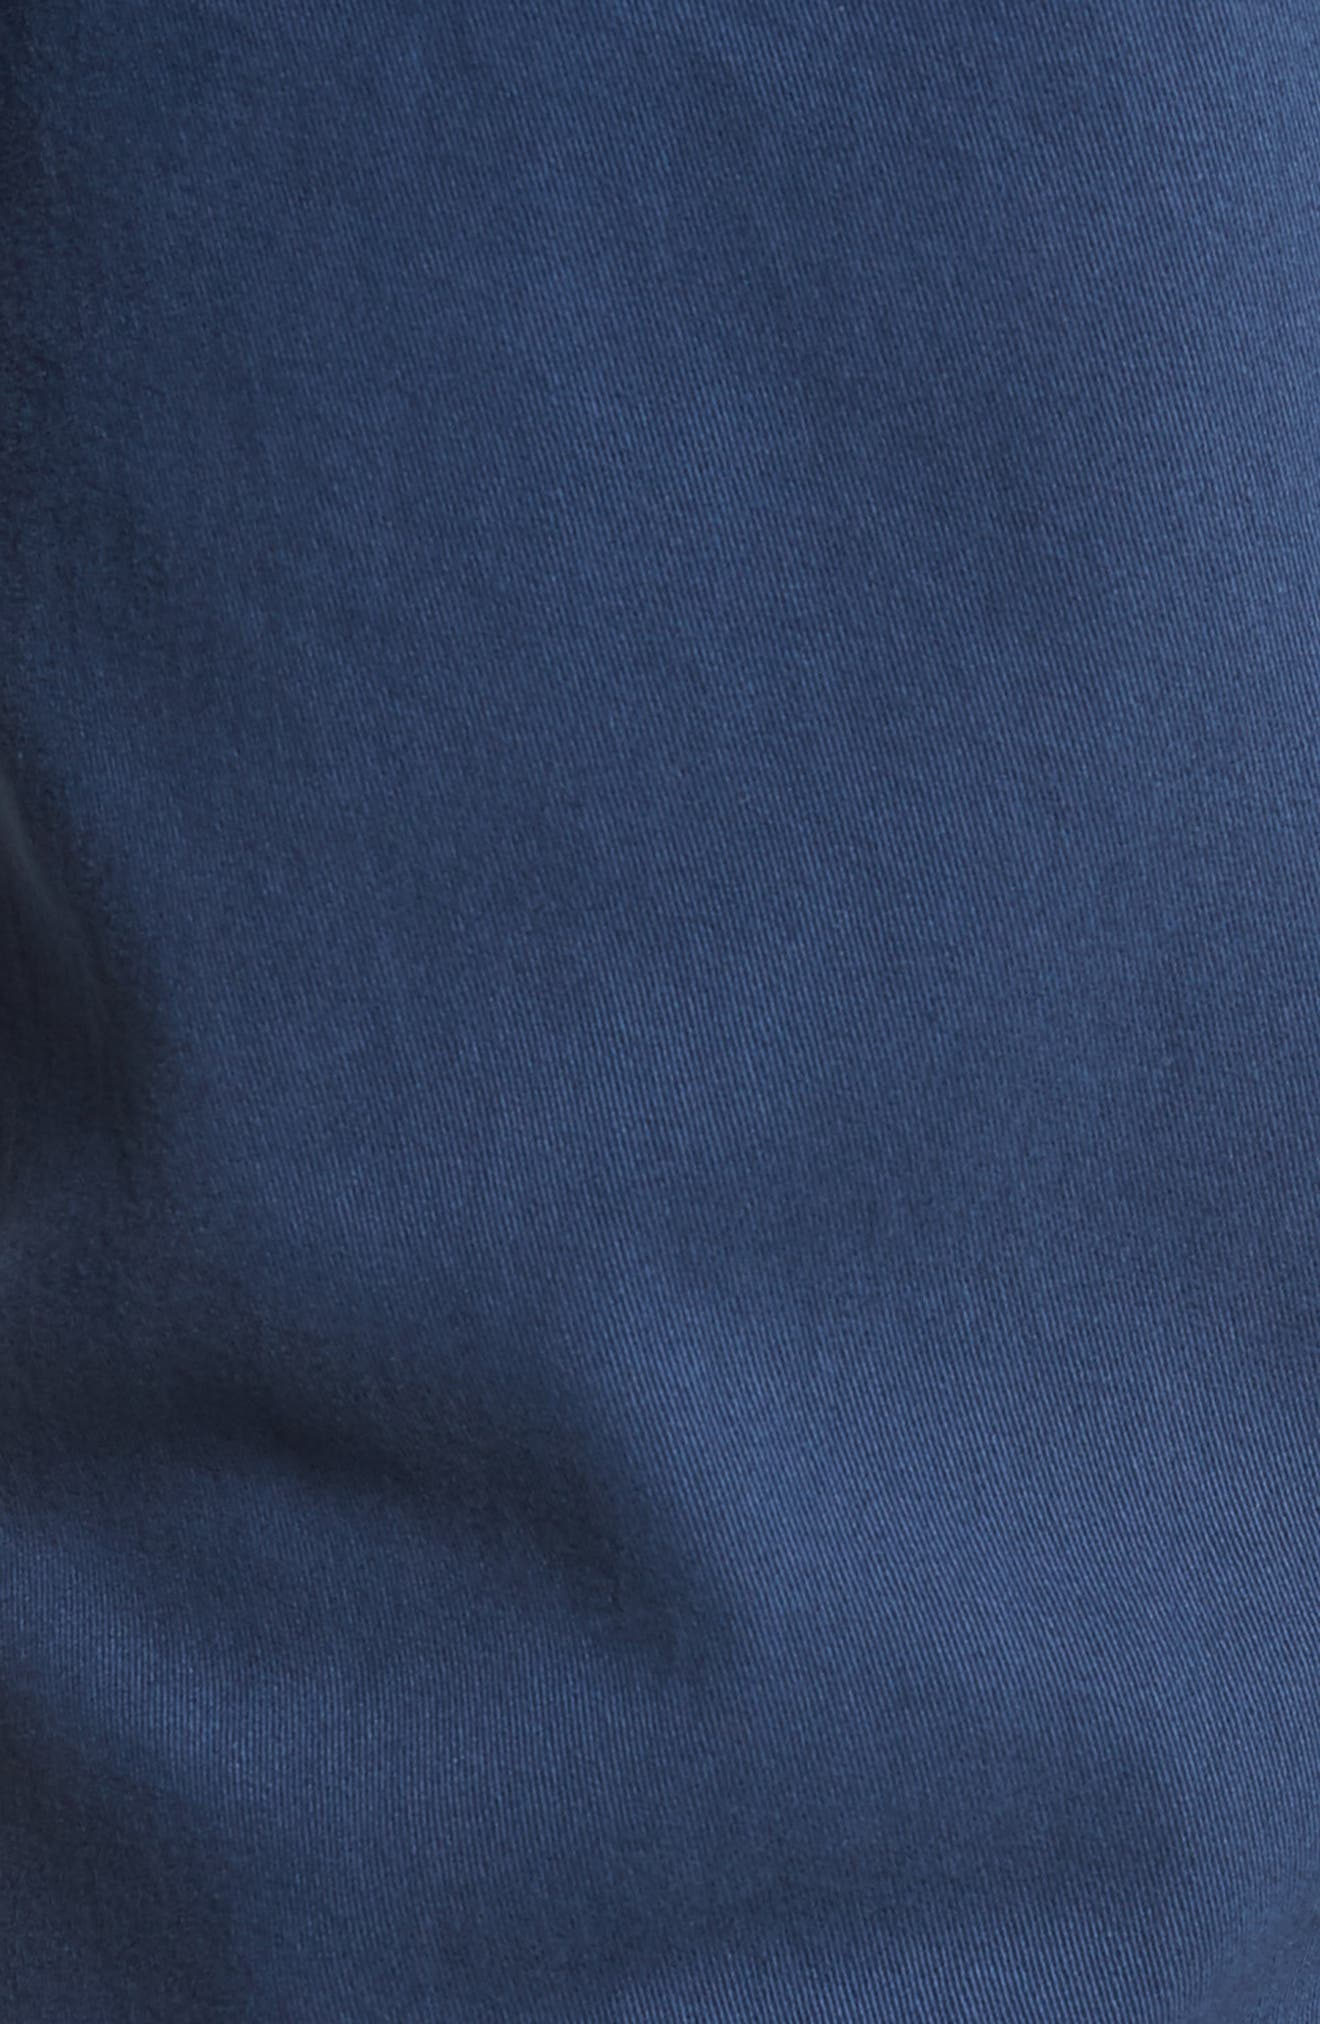 Alternate Image 5  - Liverpool Jeans Co. Kingston Slim Straight Leg Jeans (Blue Twilight)